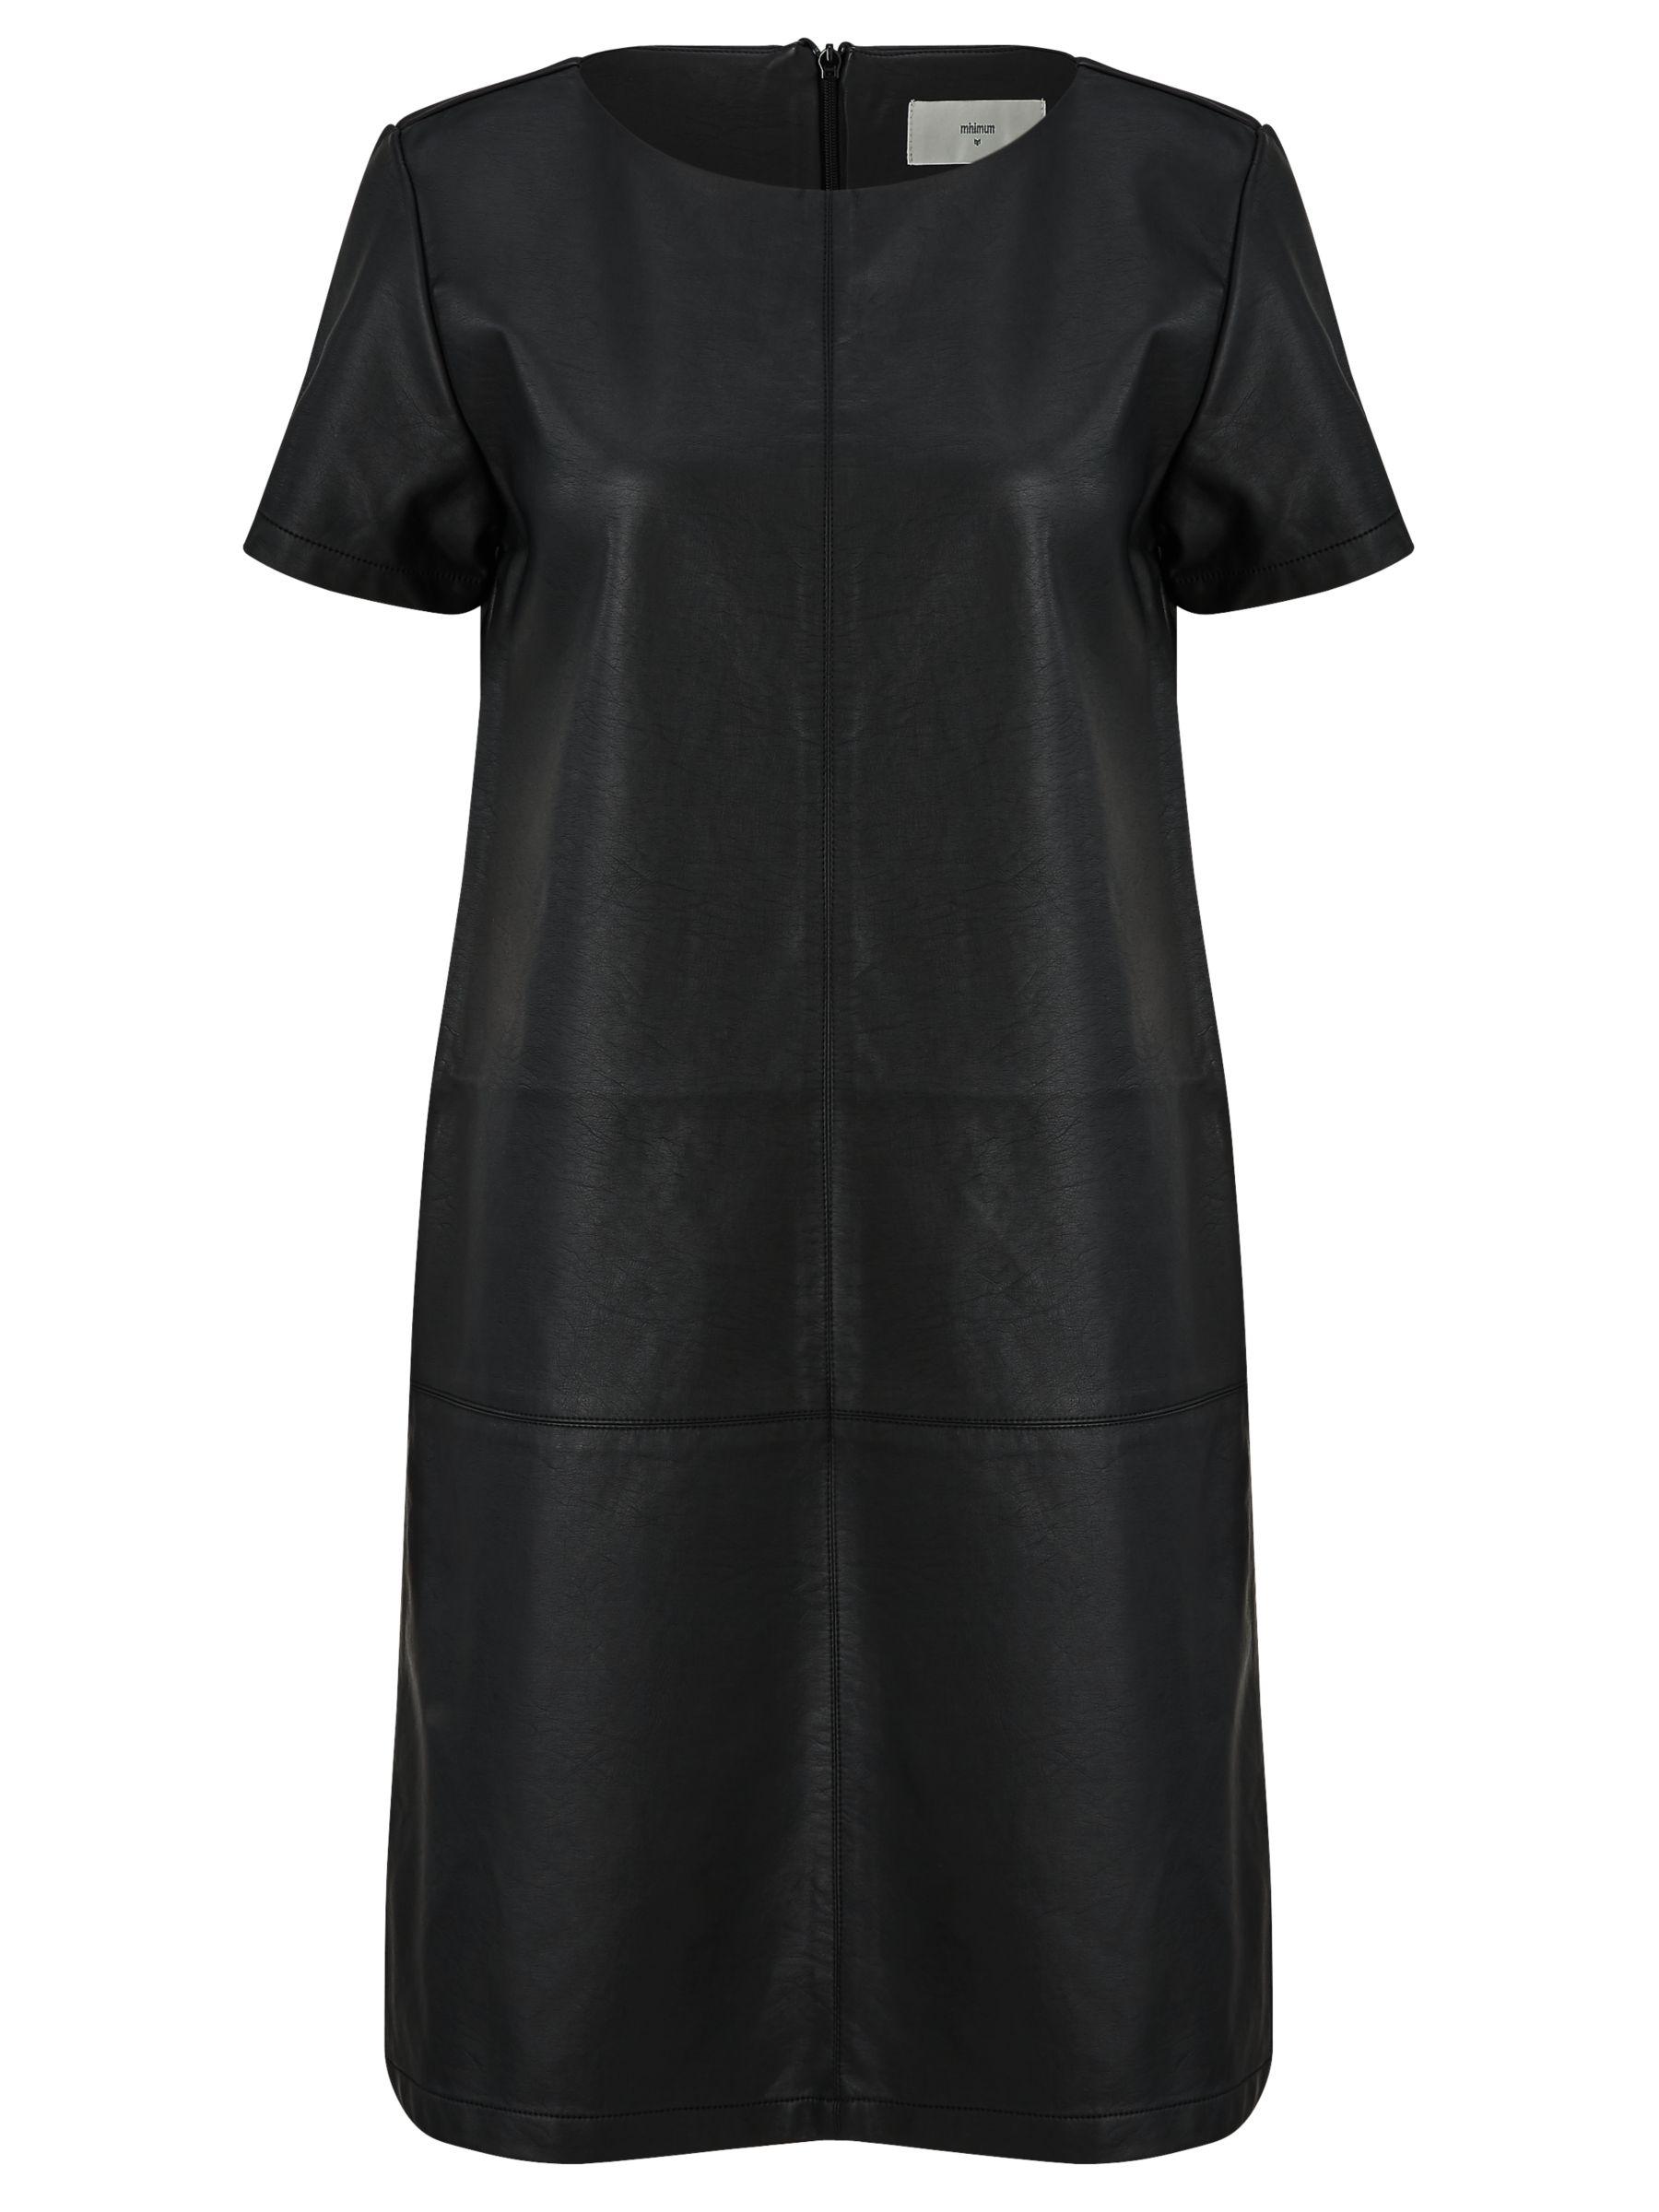 Minimum Minimum Viki Dress, Black